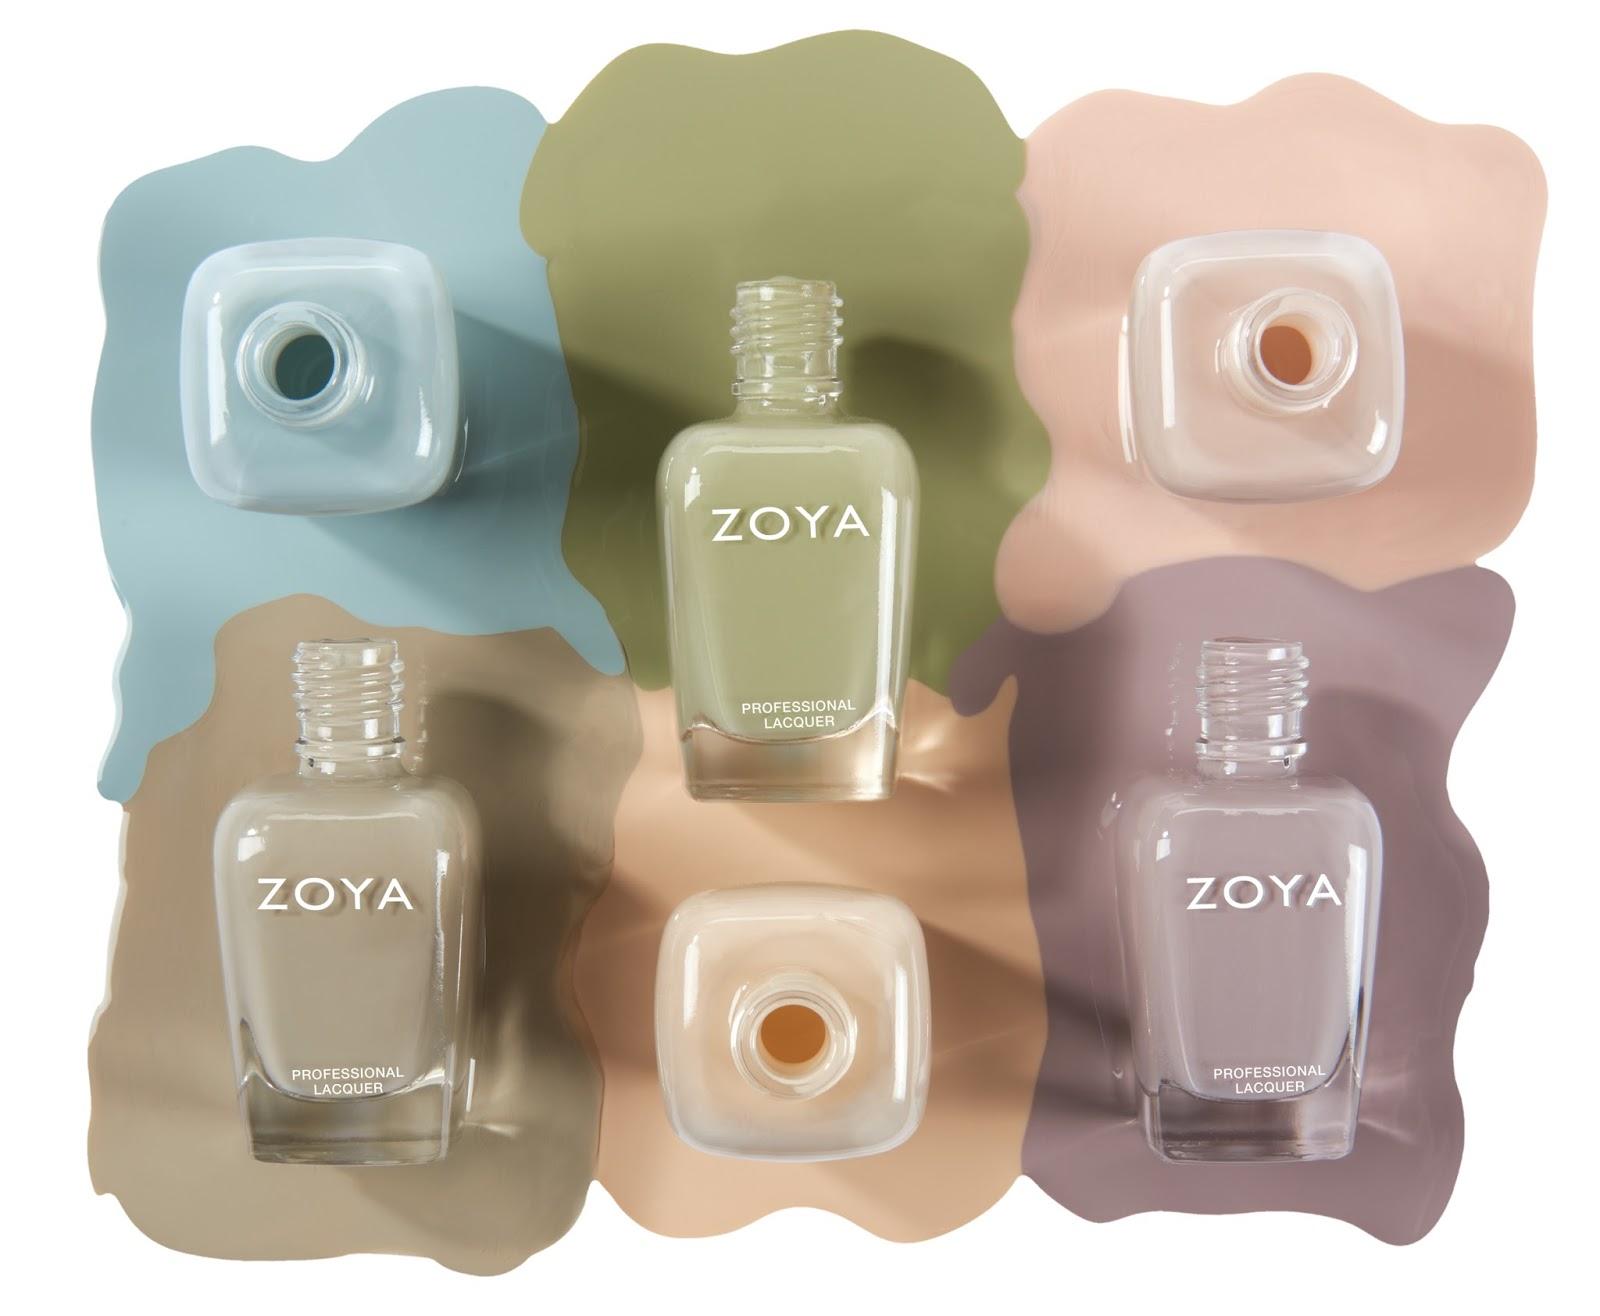 Zoya Whispers Nail Polish Collection News - BeautyAlmanac.com